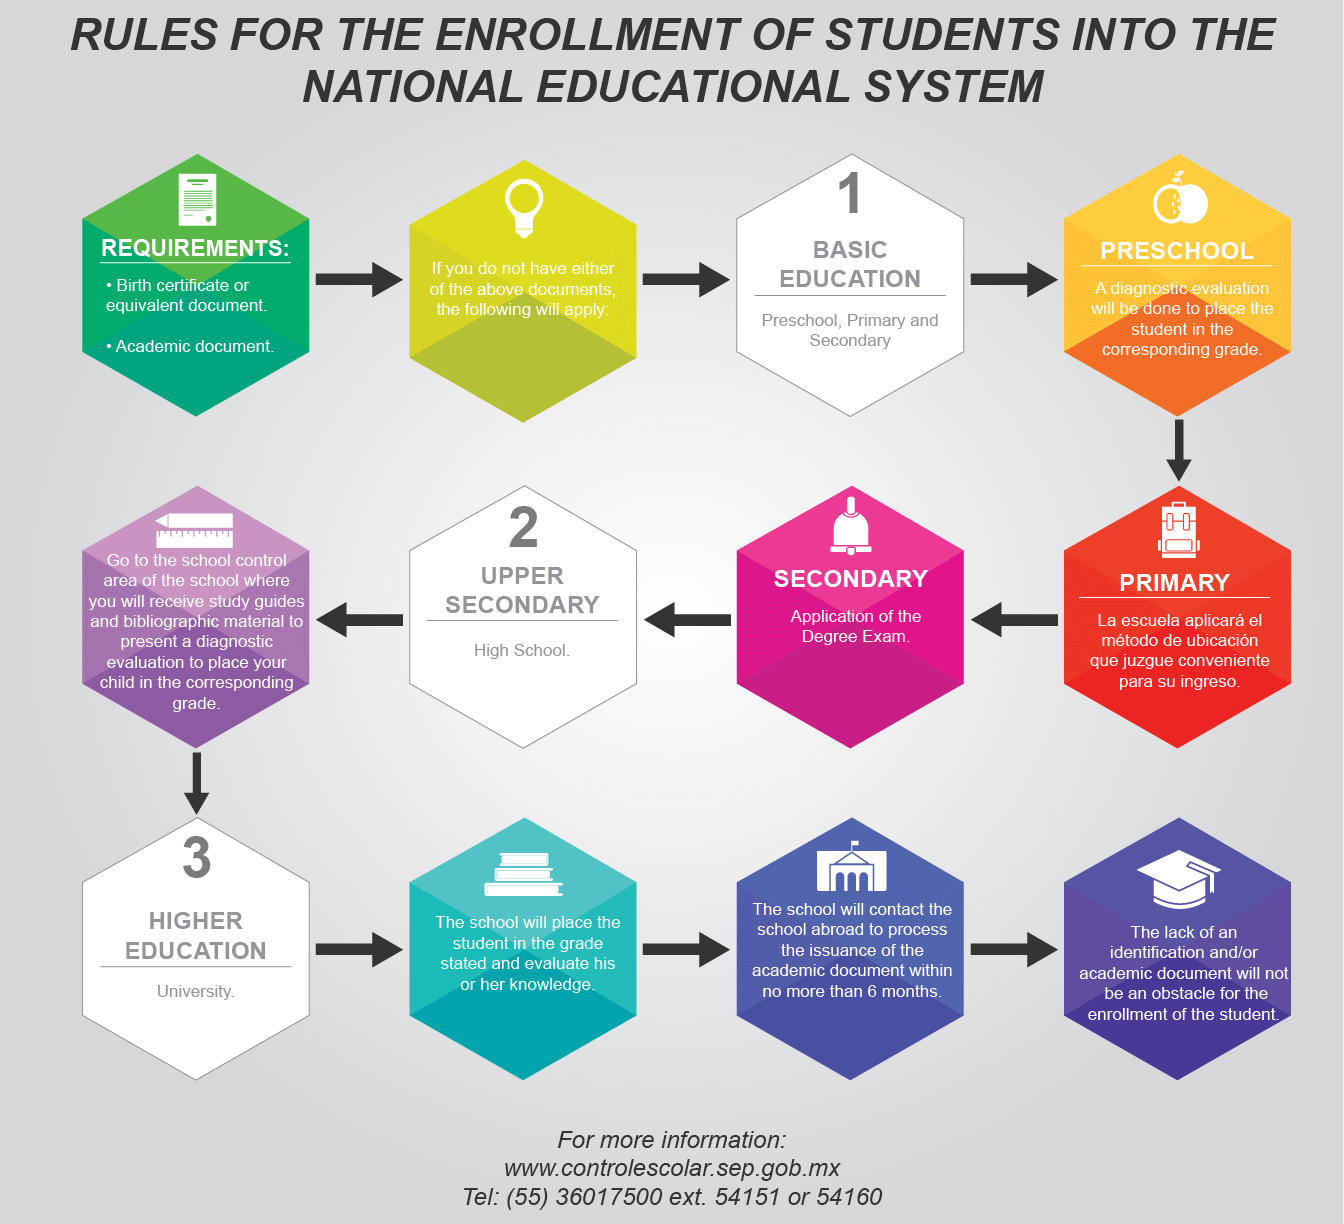 Enrollment rules